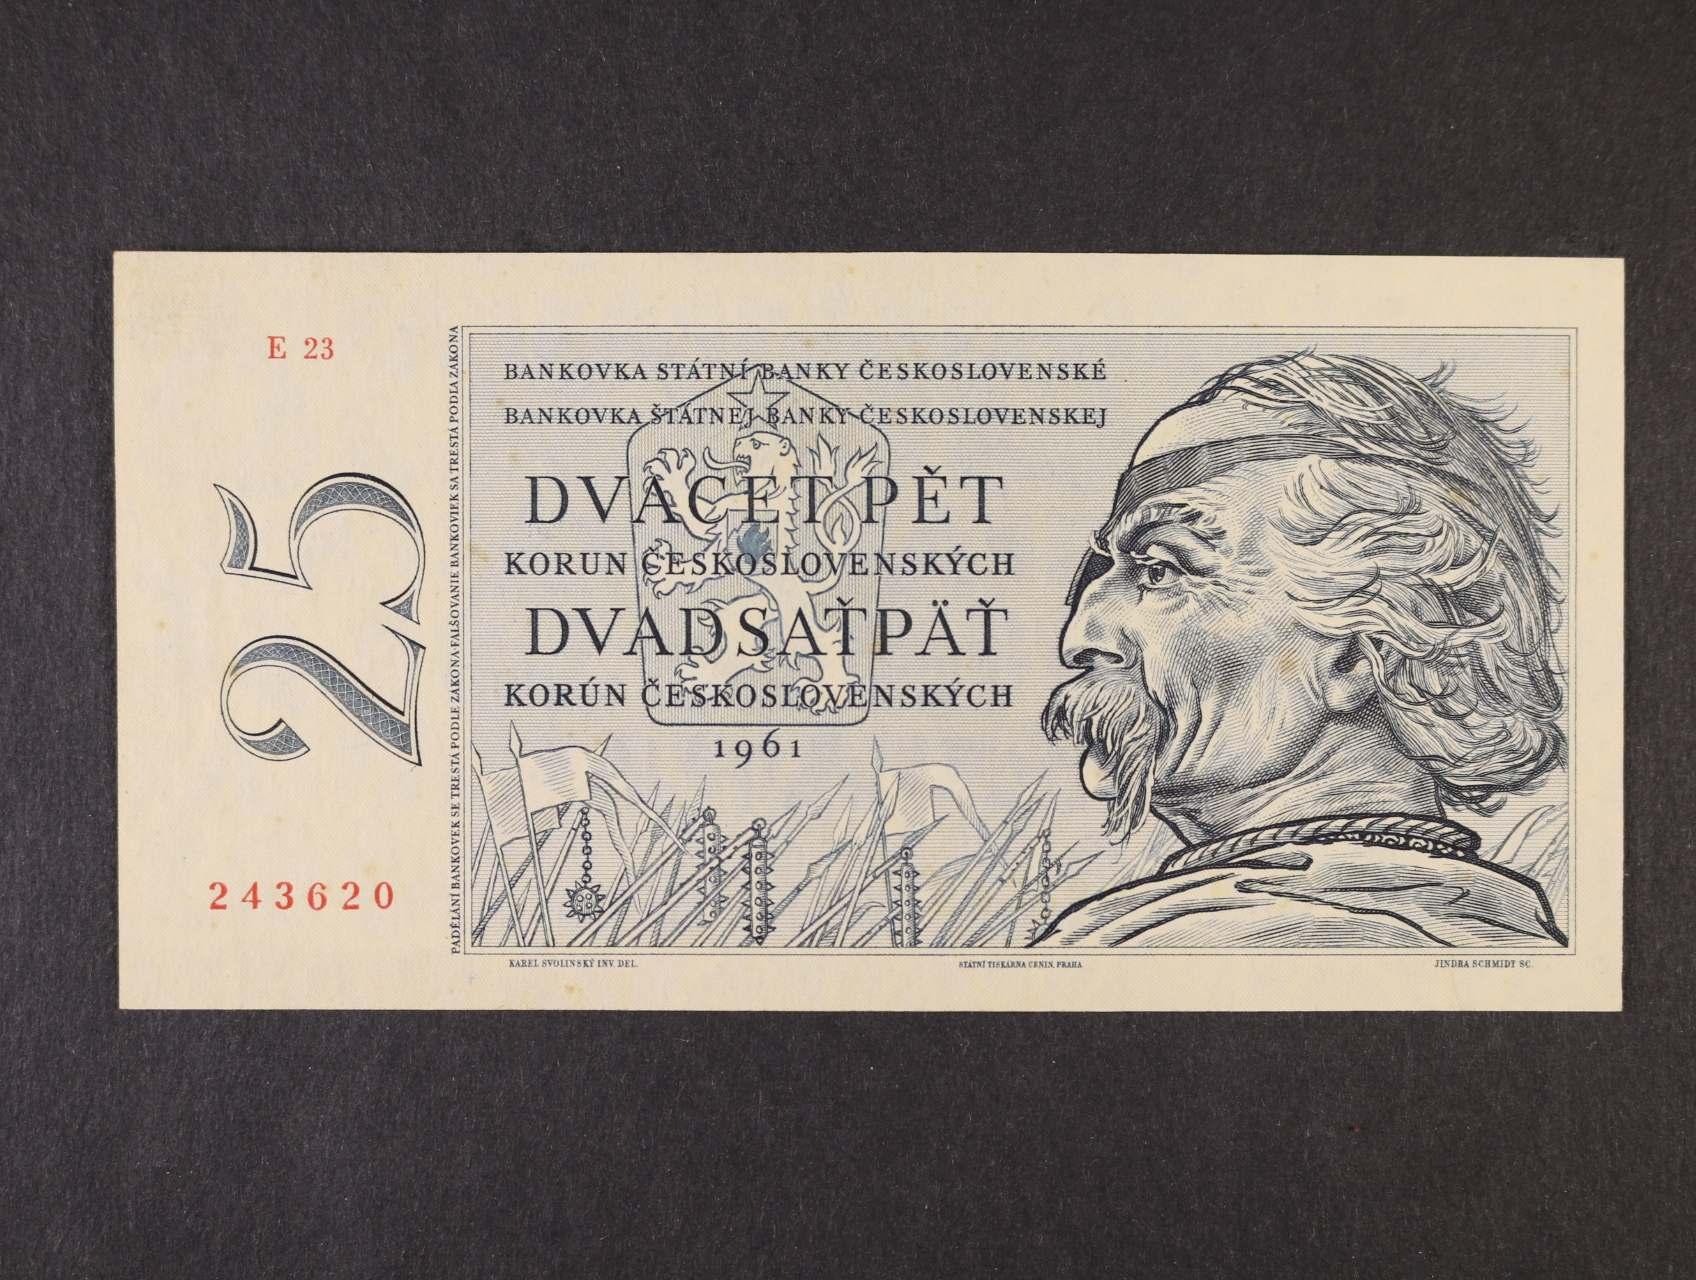 25 Kčs 1961 série E 23, Ba 97a, Pi 89a